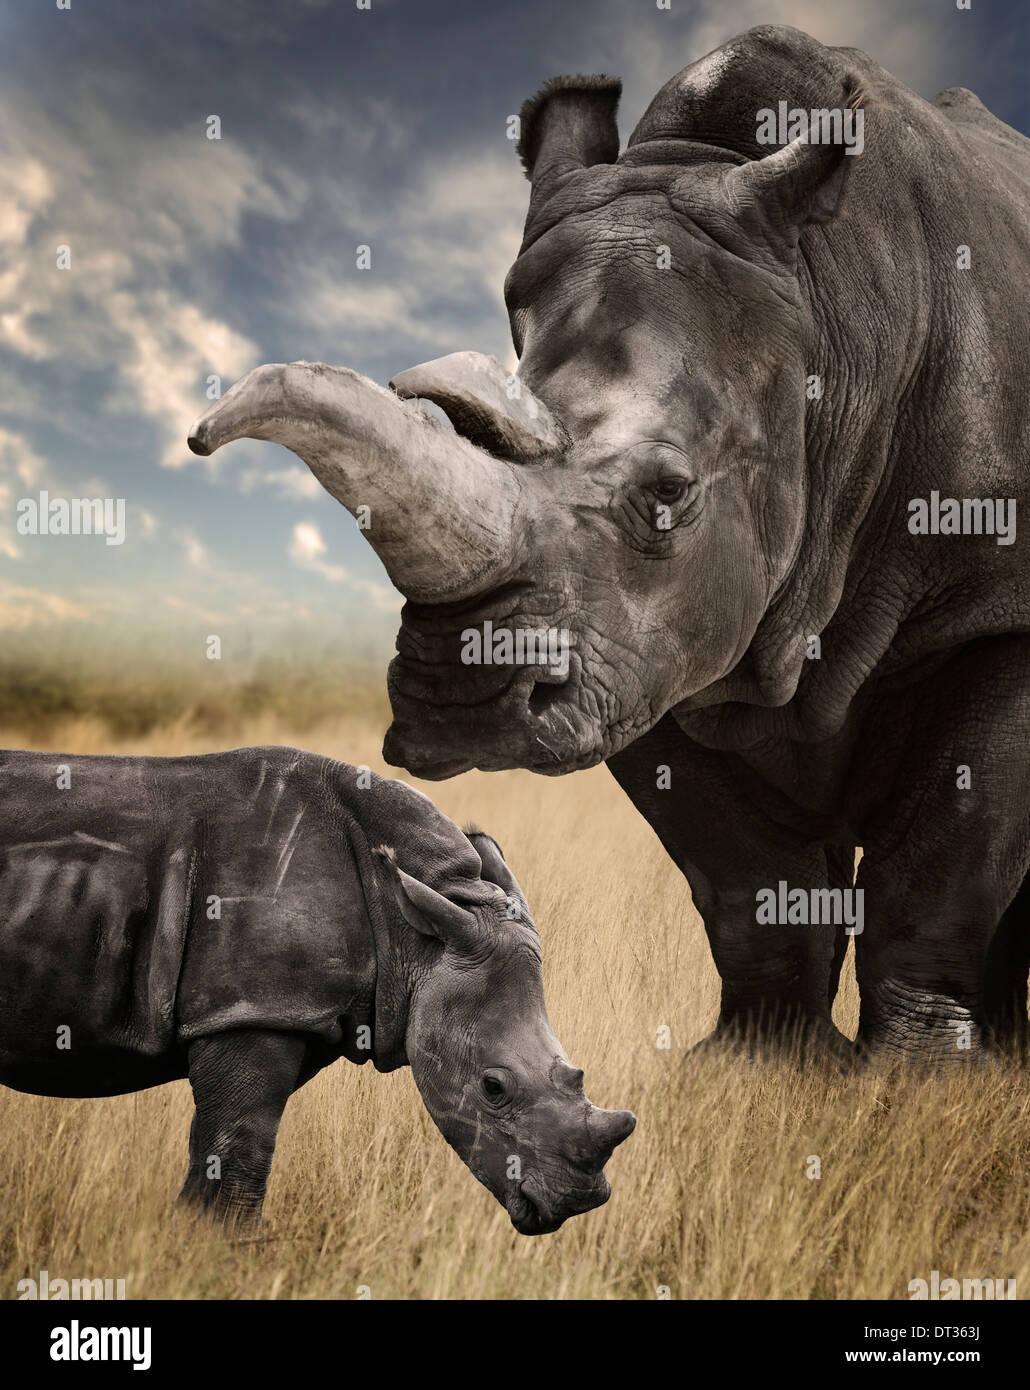 Mother And Baby White Rhino Grazing - Stock Image